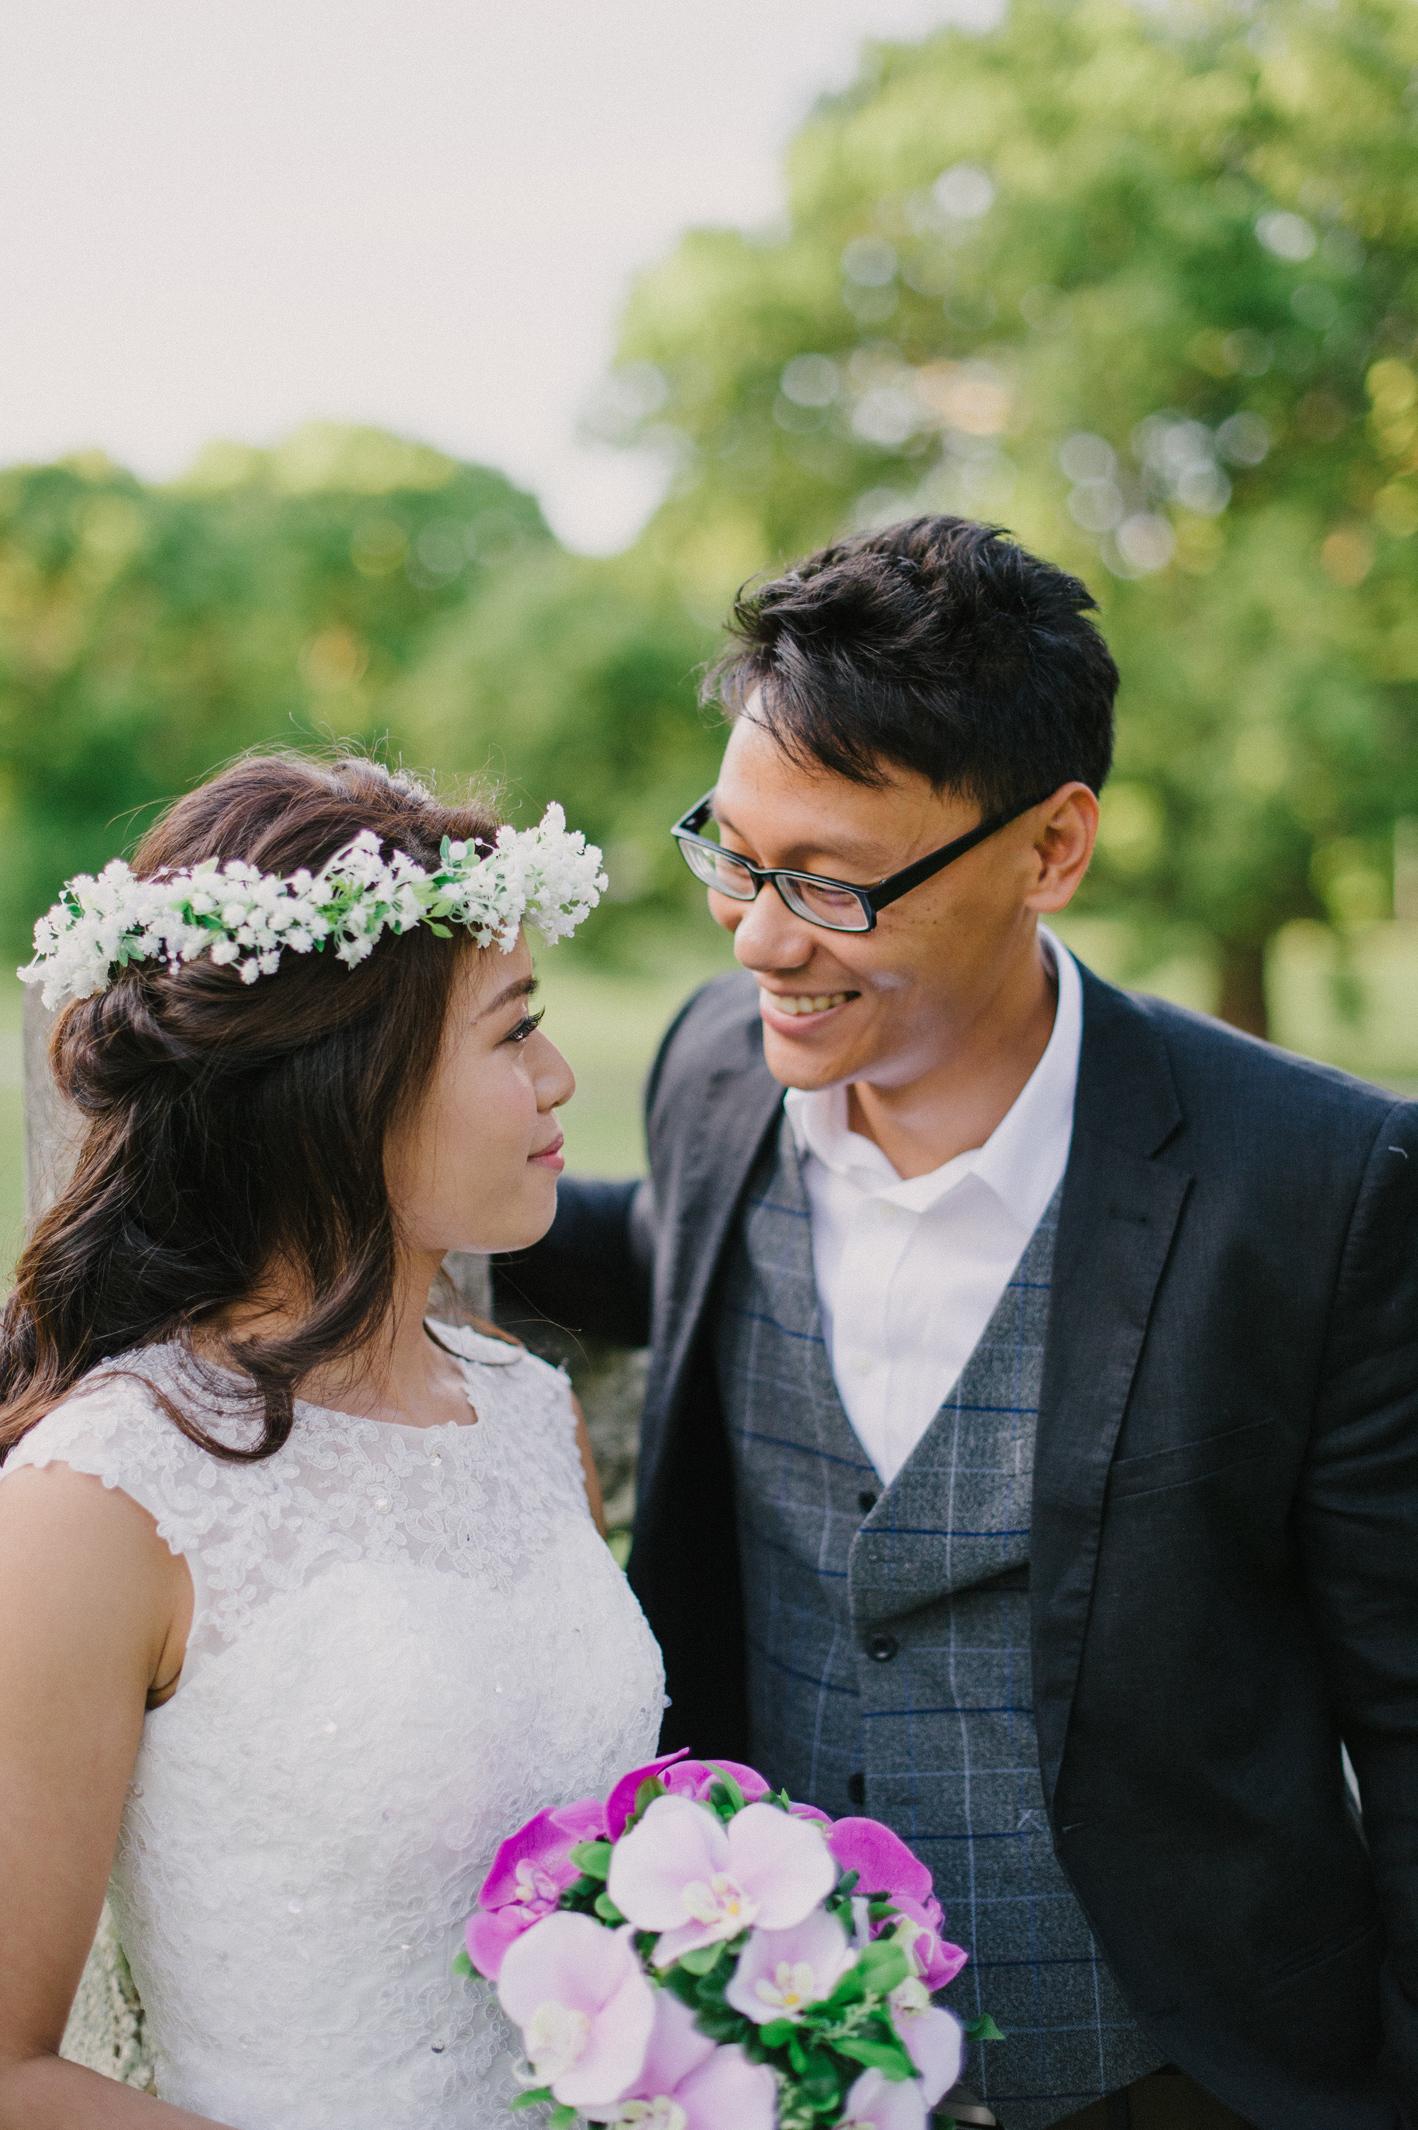 007-ed-janet-currumbin-wedding_sophie-baker-photography